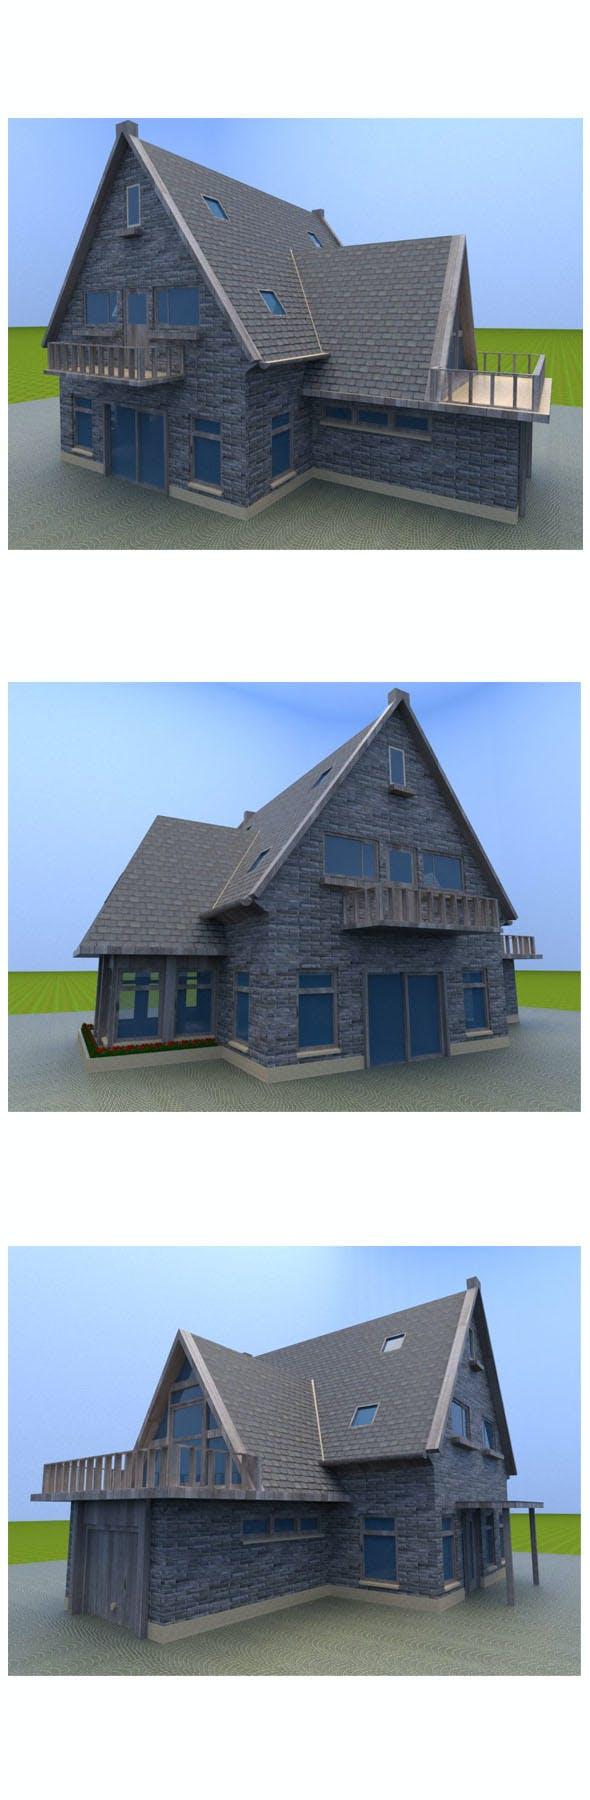 Old house design - 3DOcean Item for Sale